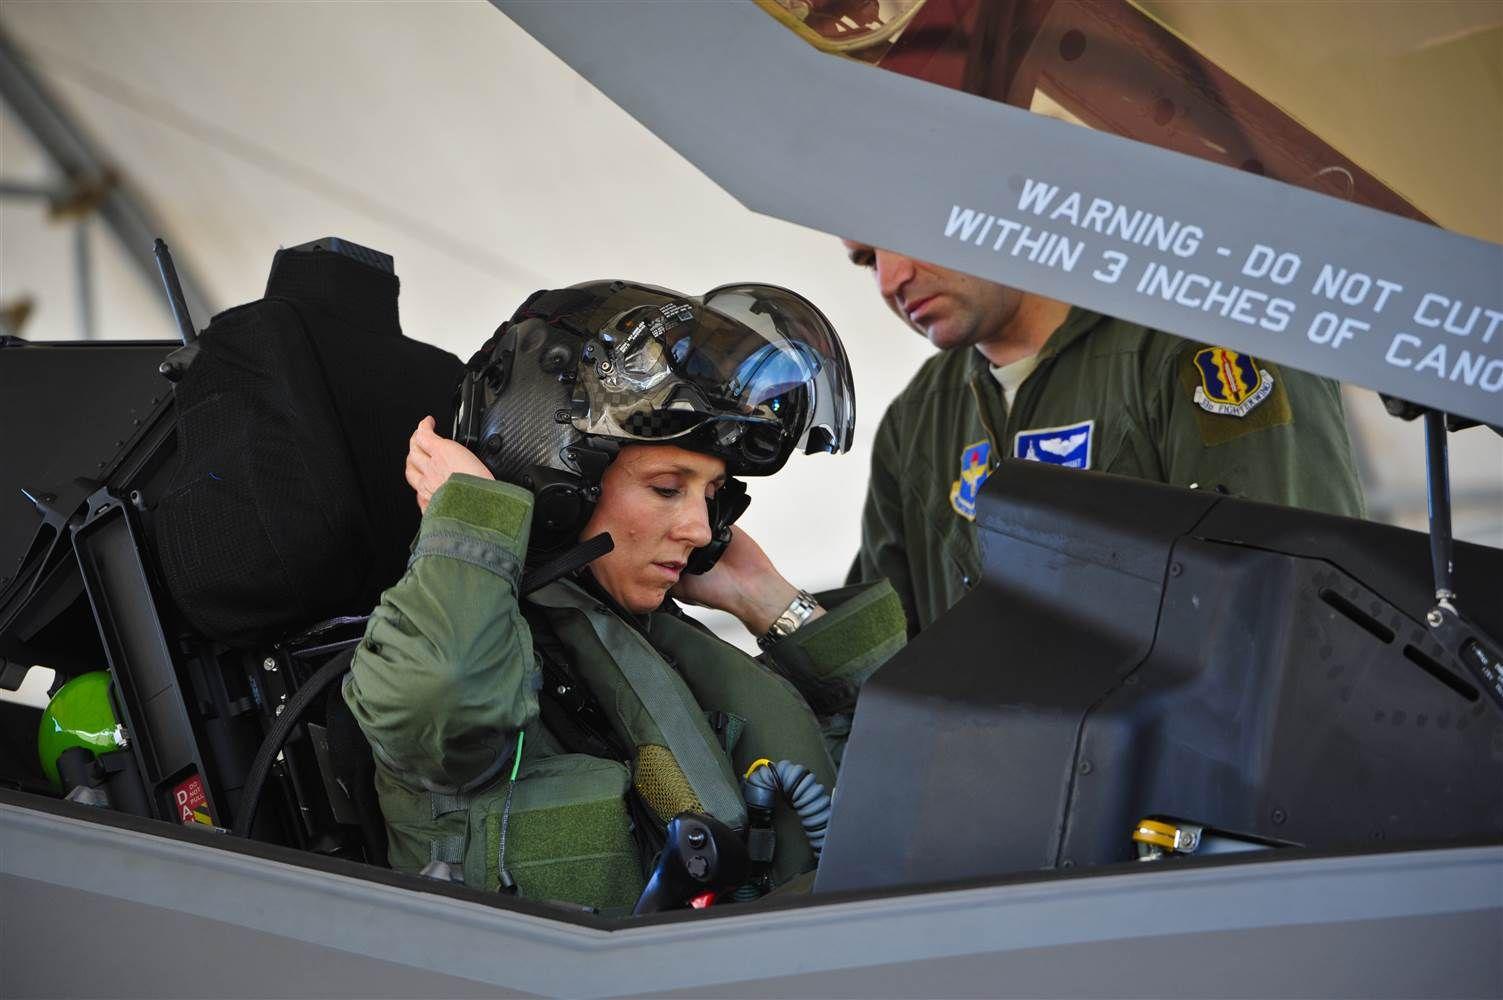 Christine Mau Becomes First U.S. Female Pilot to Fly F-35 Lightning II Jet.